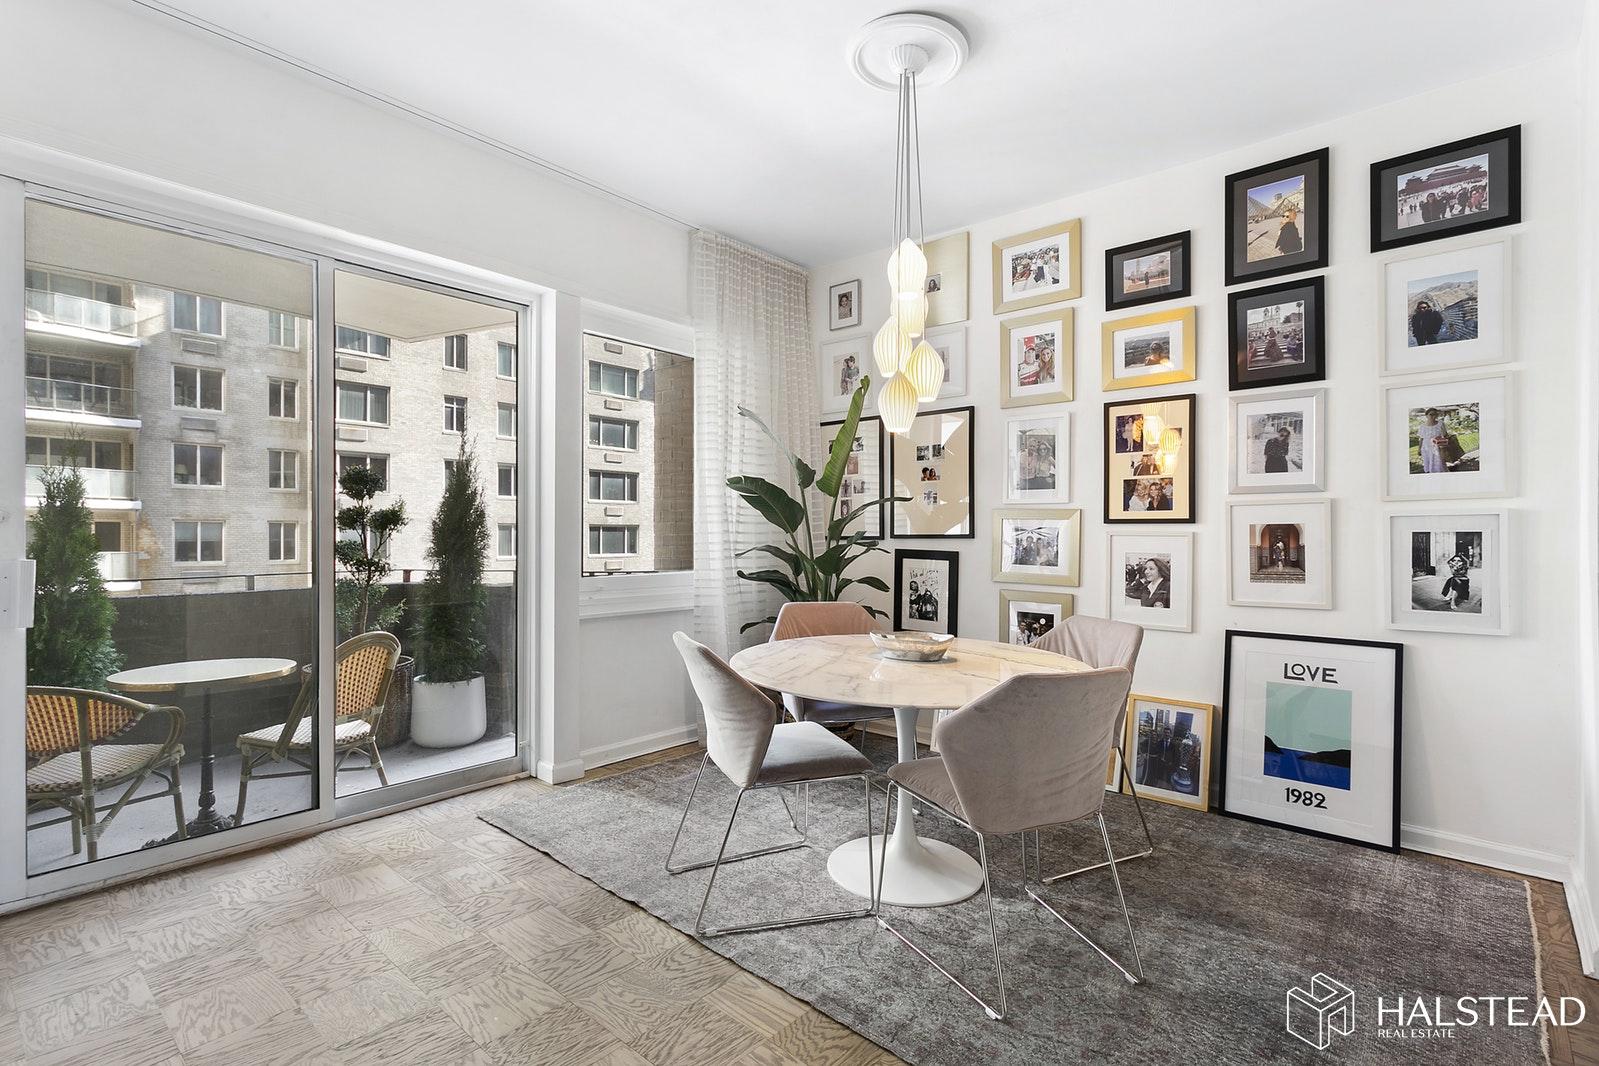 58 WEST 58TH STREET, Midtown West, $1,100,000, Web #: 19487852